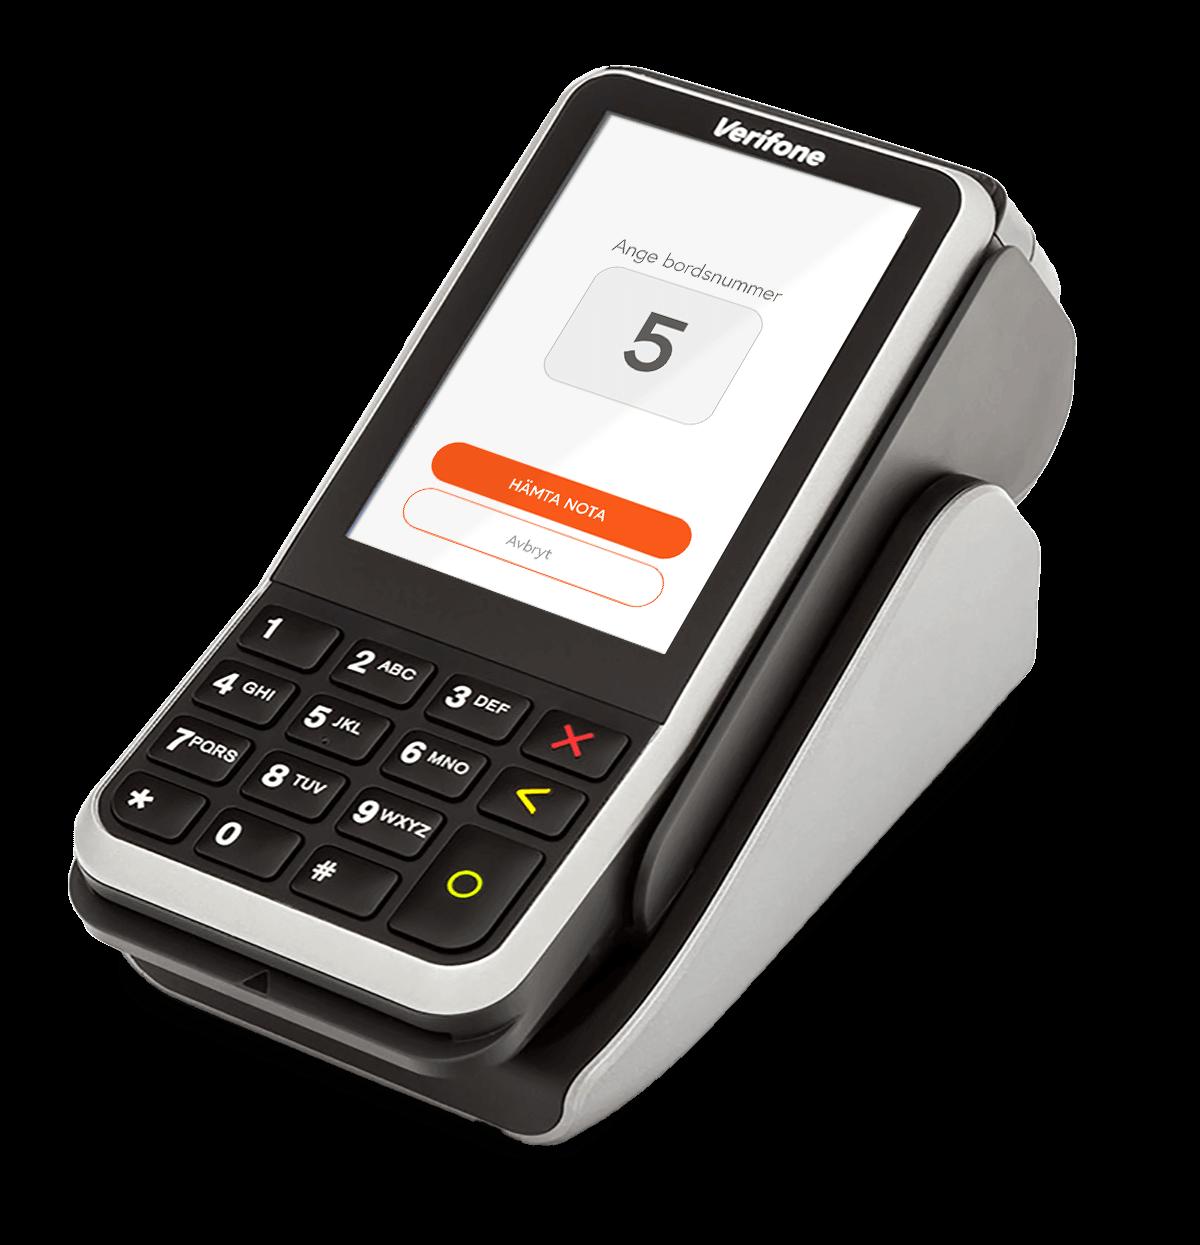 Verifone V400M betalningsterminal